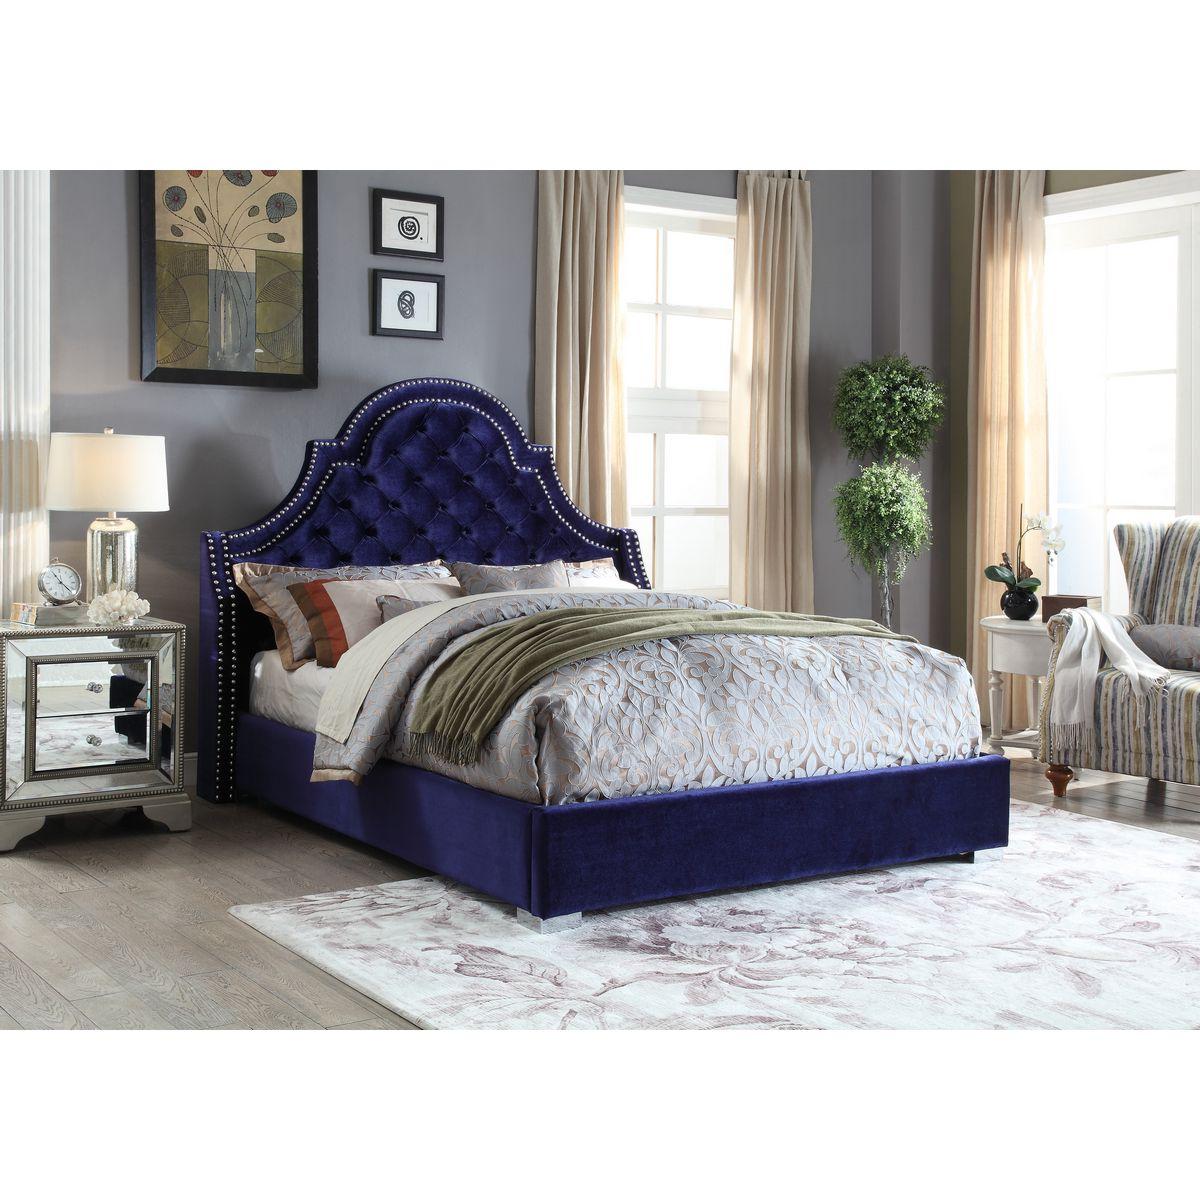 chloe on tufted velvet sofa set for hall room meridian furniture madisonnavy-q madison deep navy ...